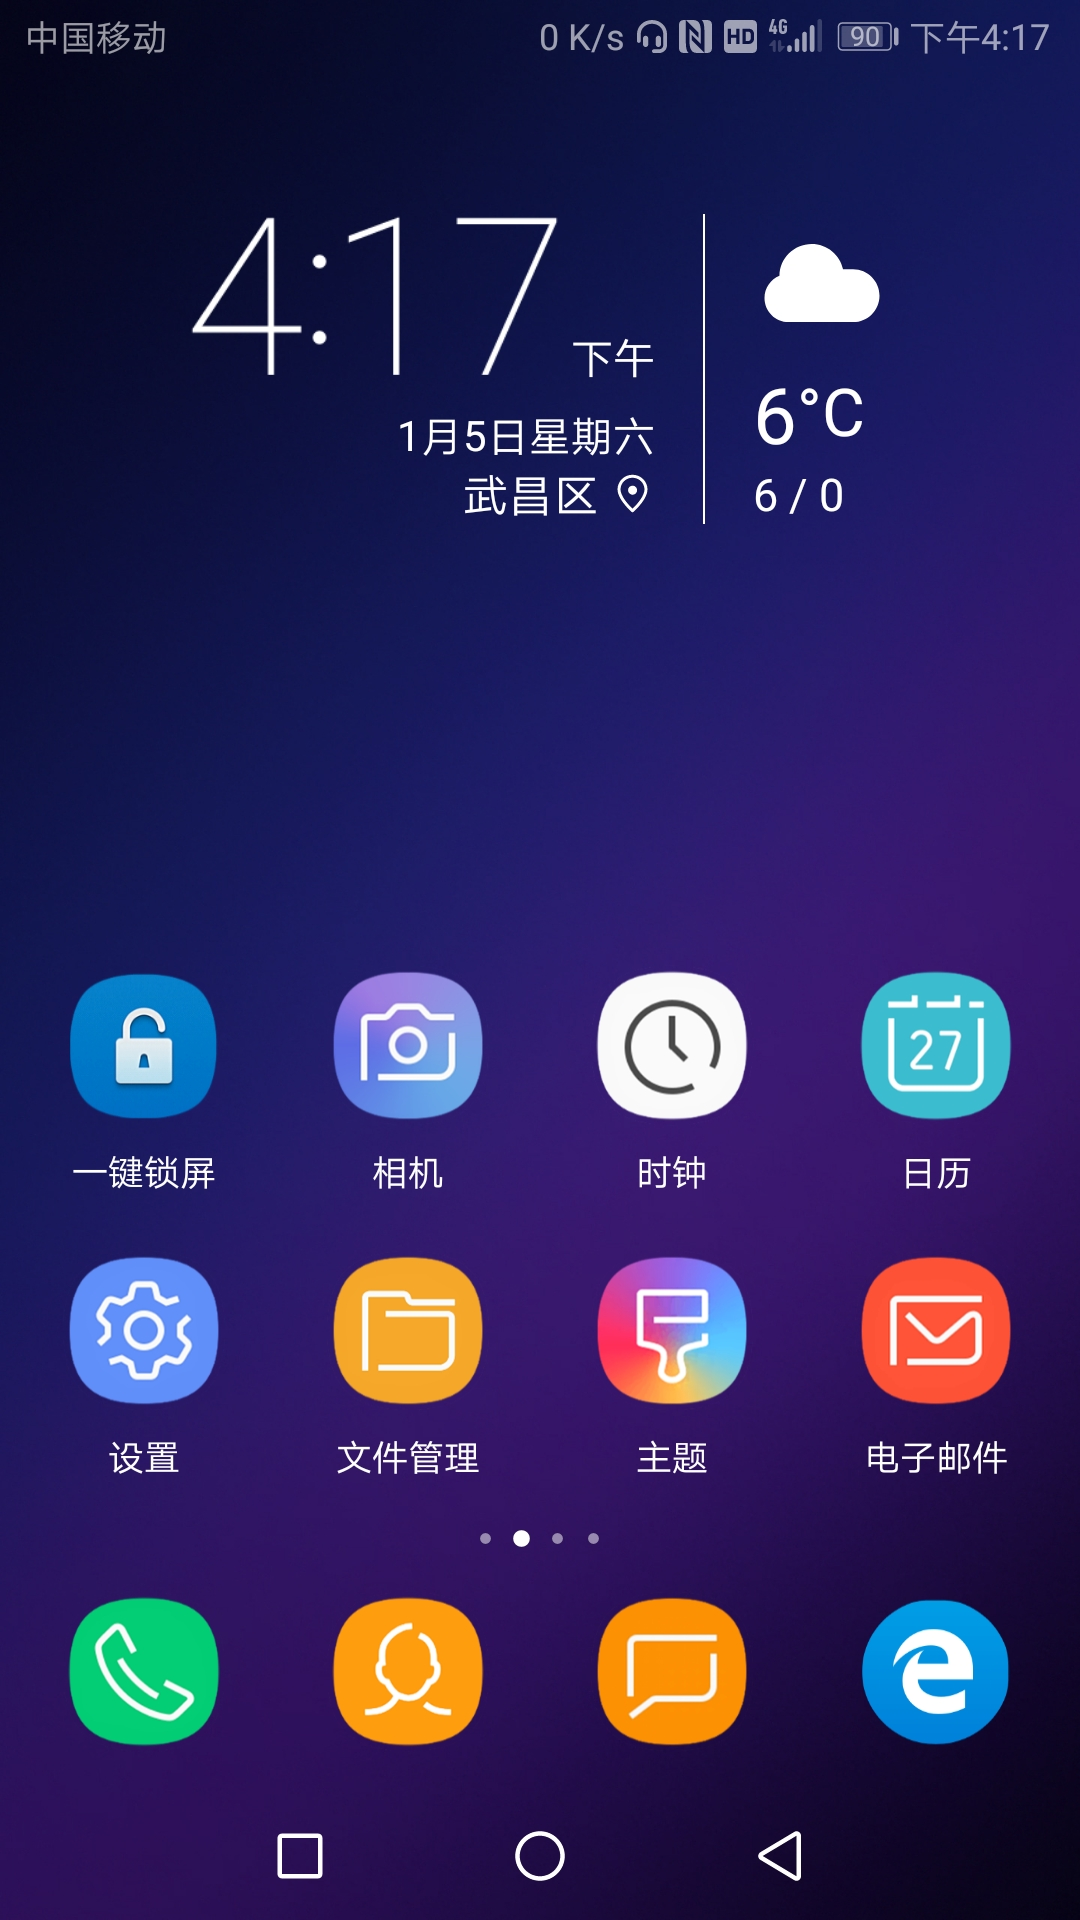 Samsung S10.jpg